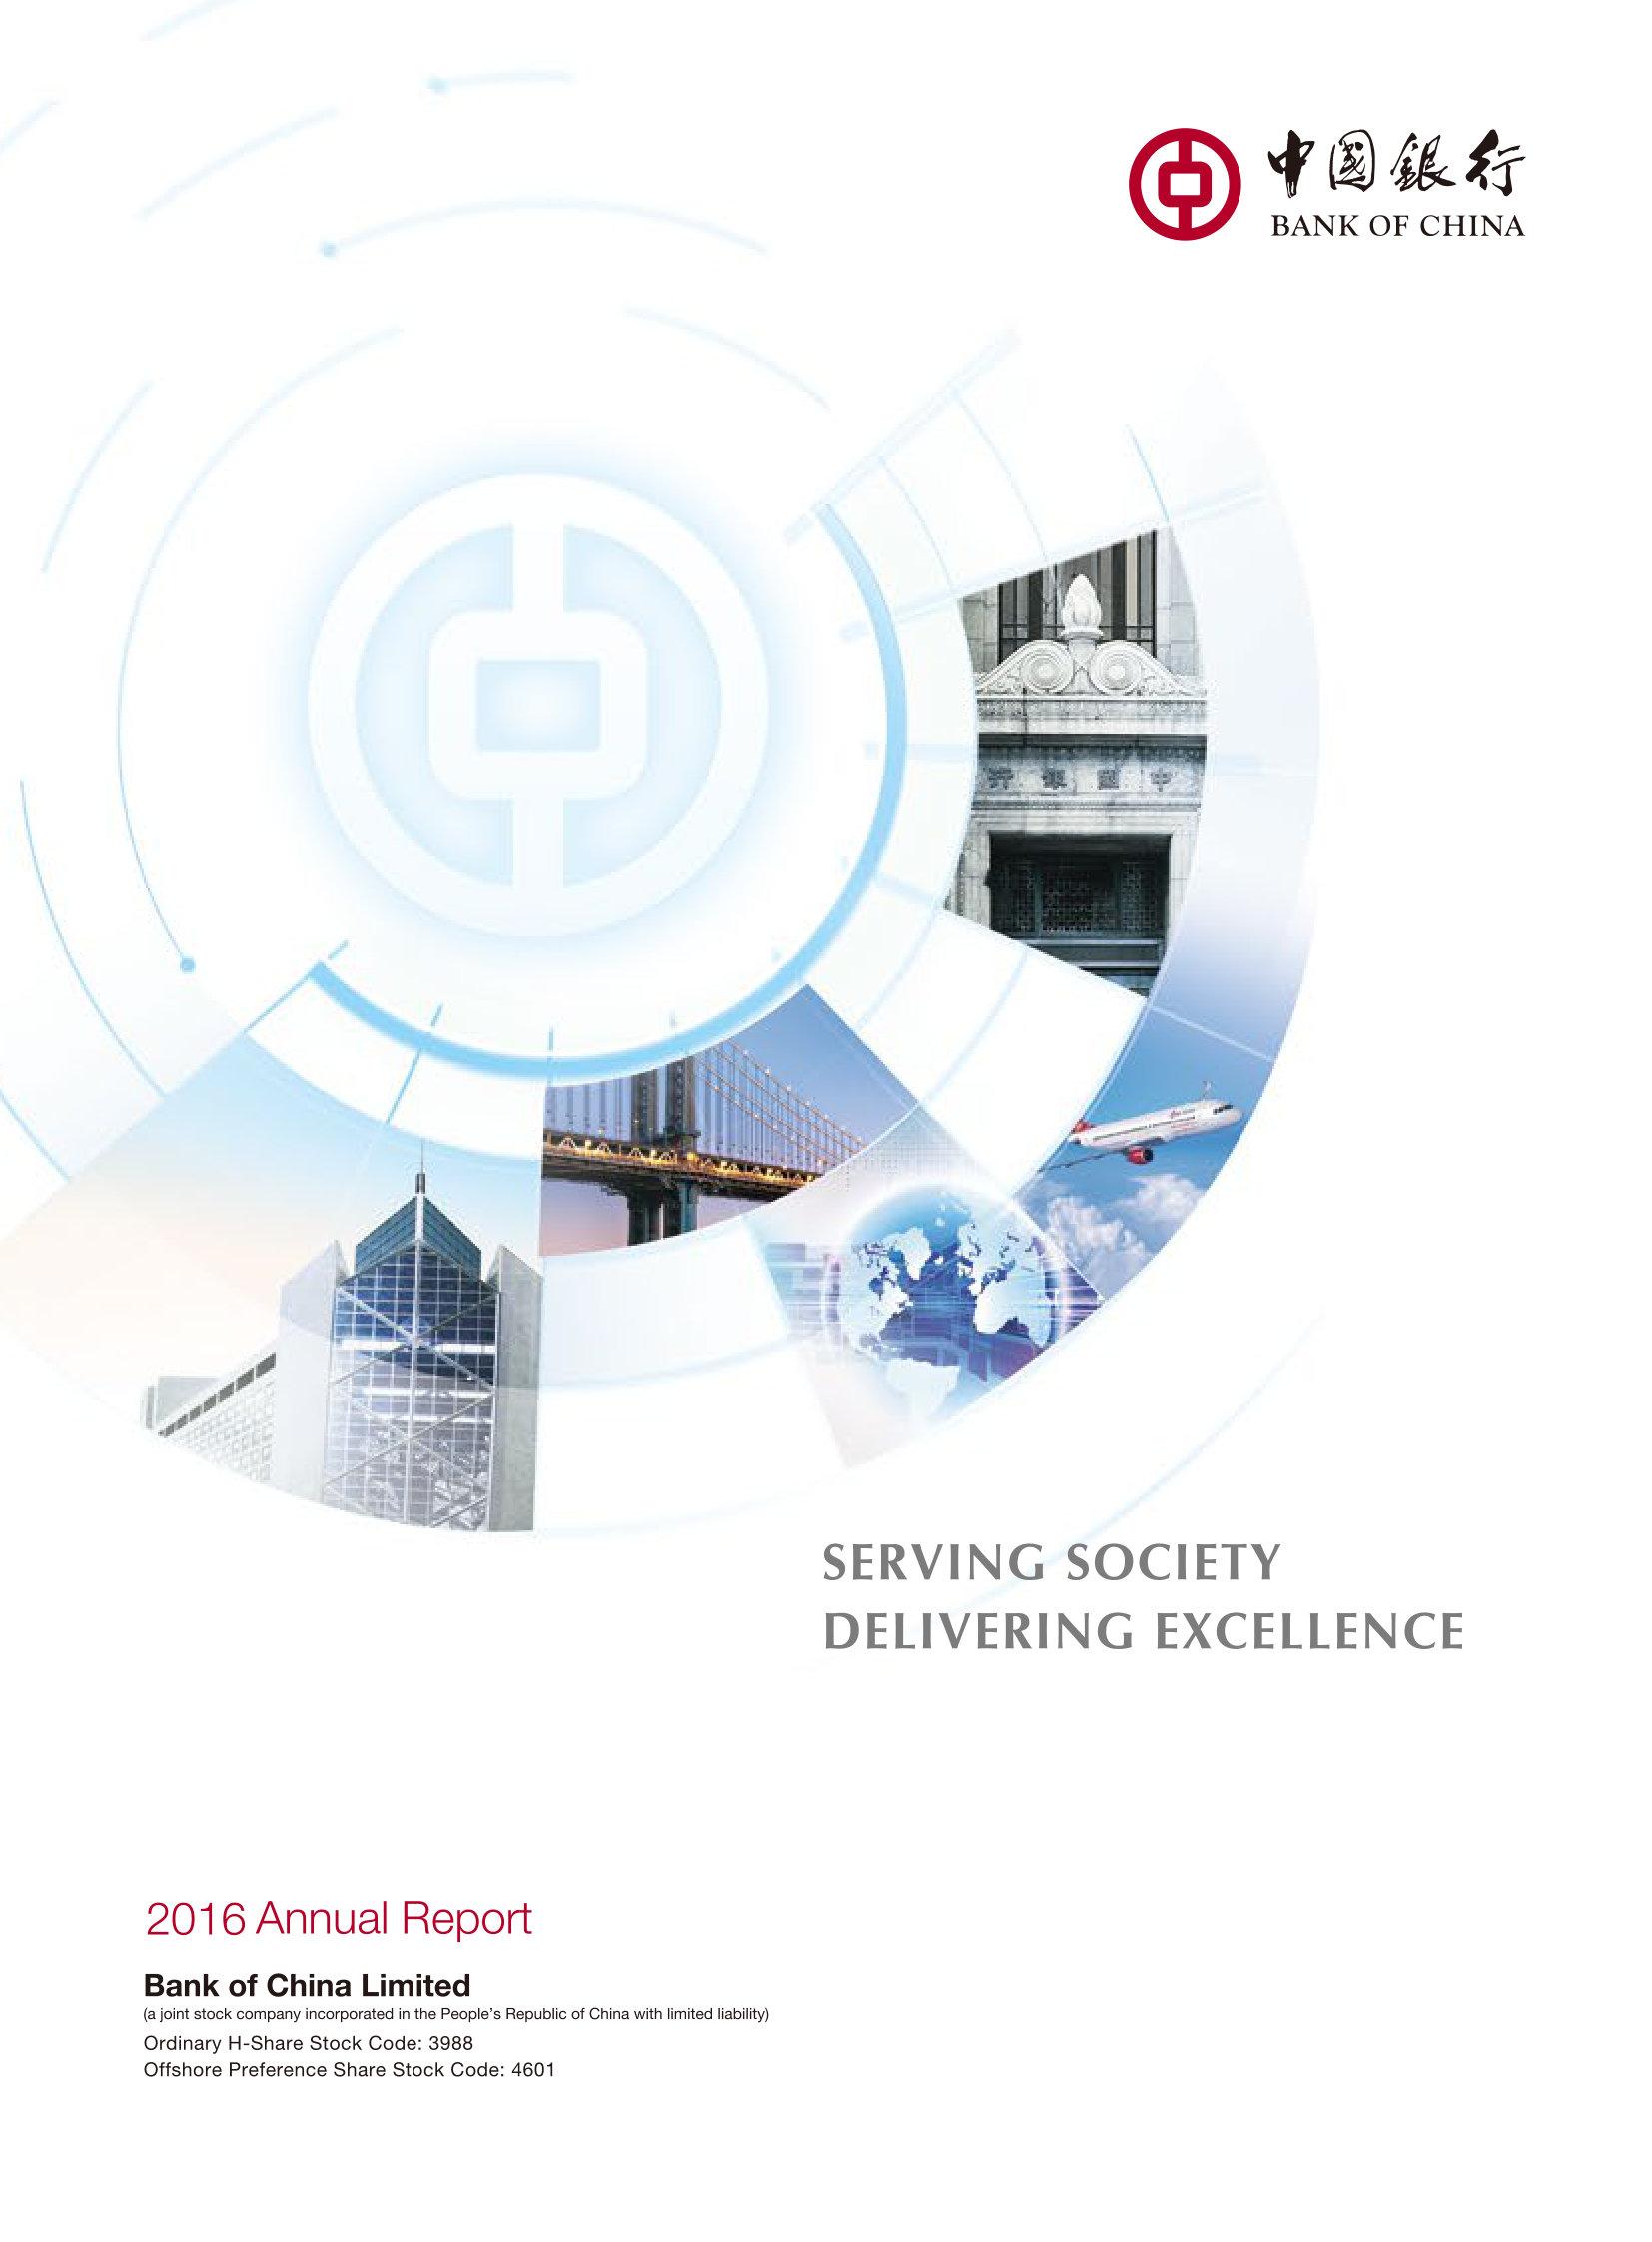 World energy outlook 2012 presentation templates